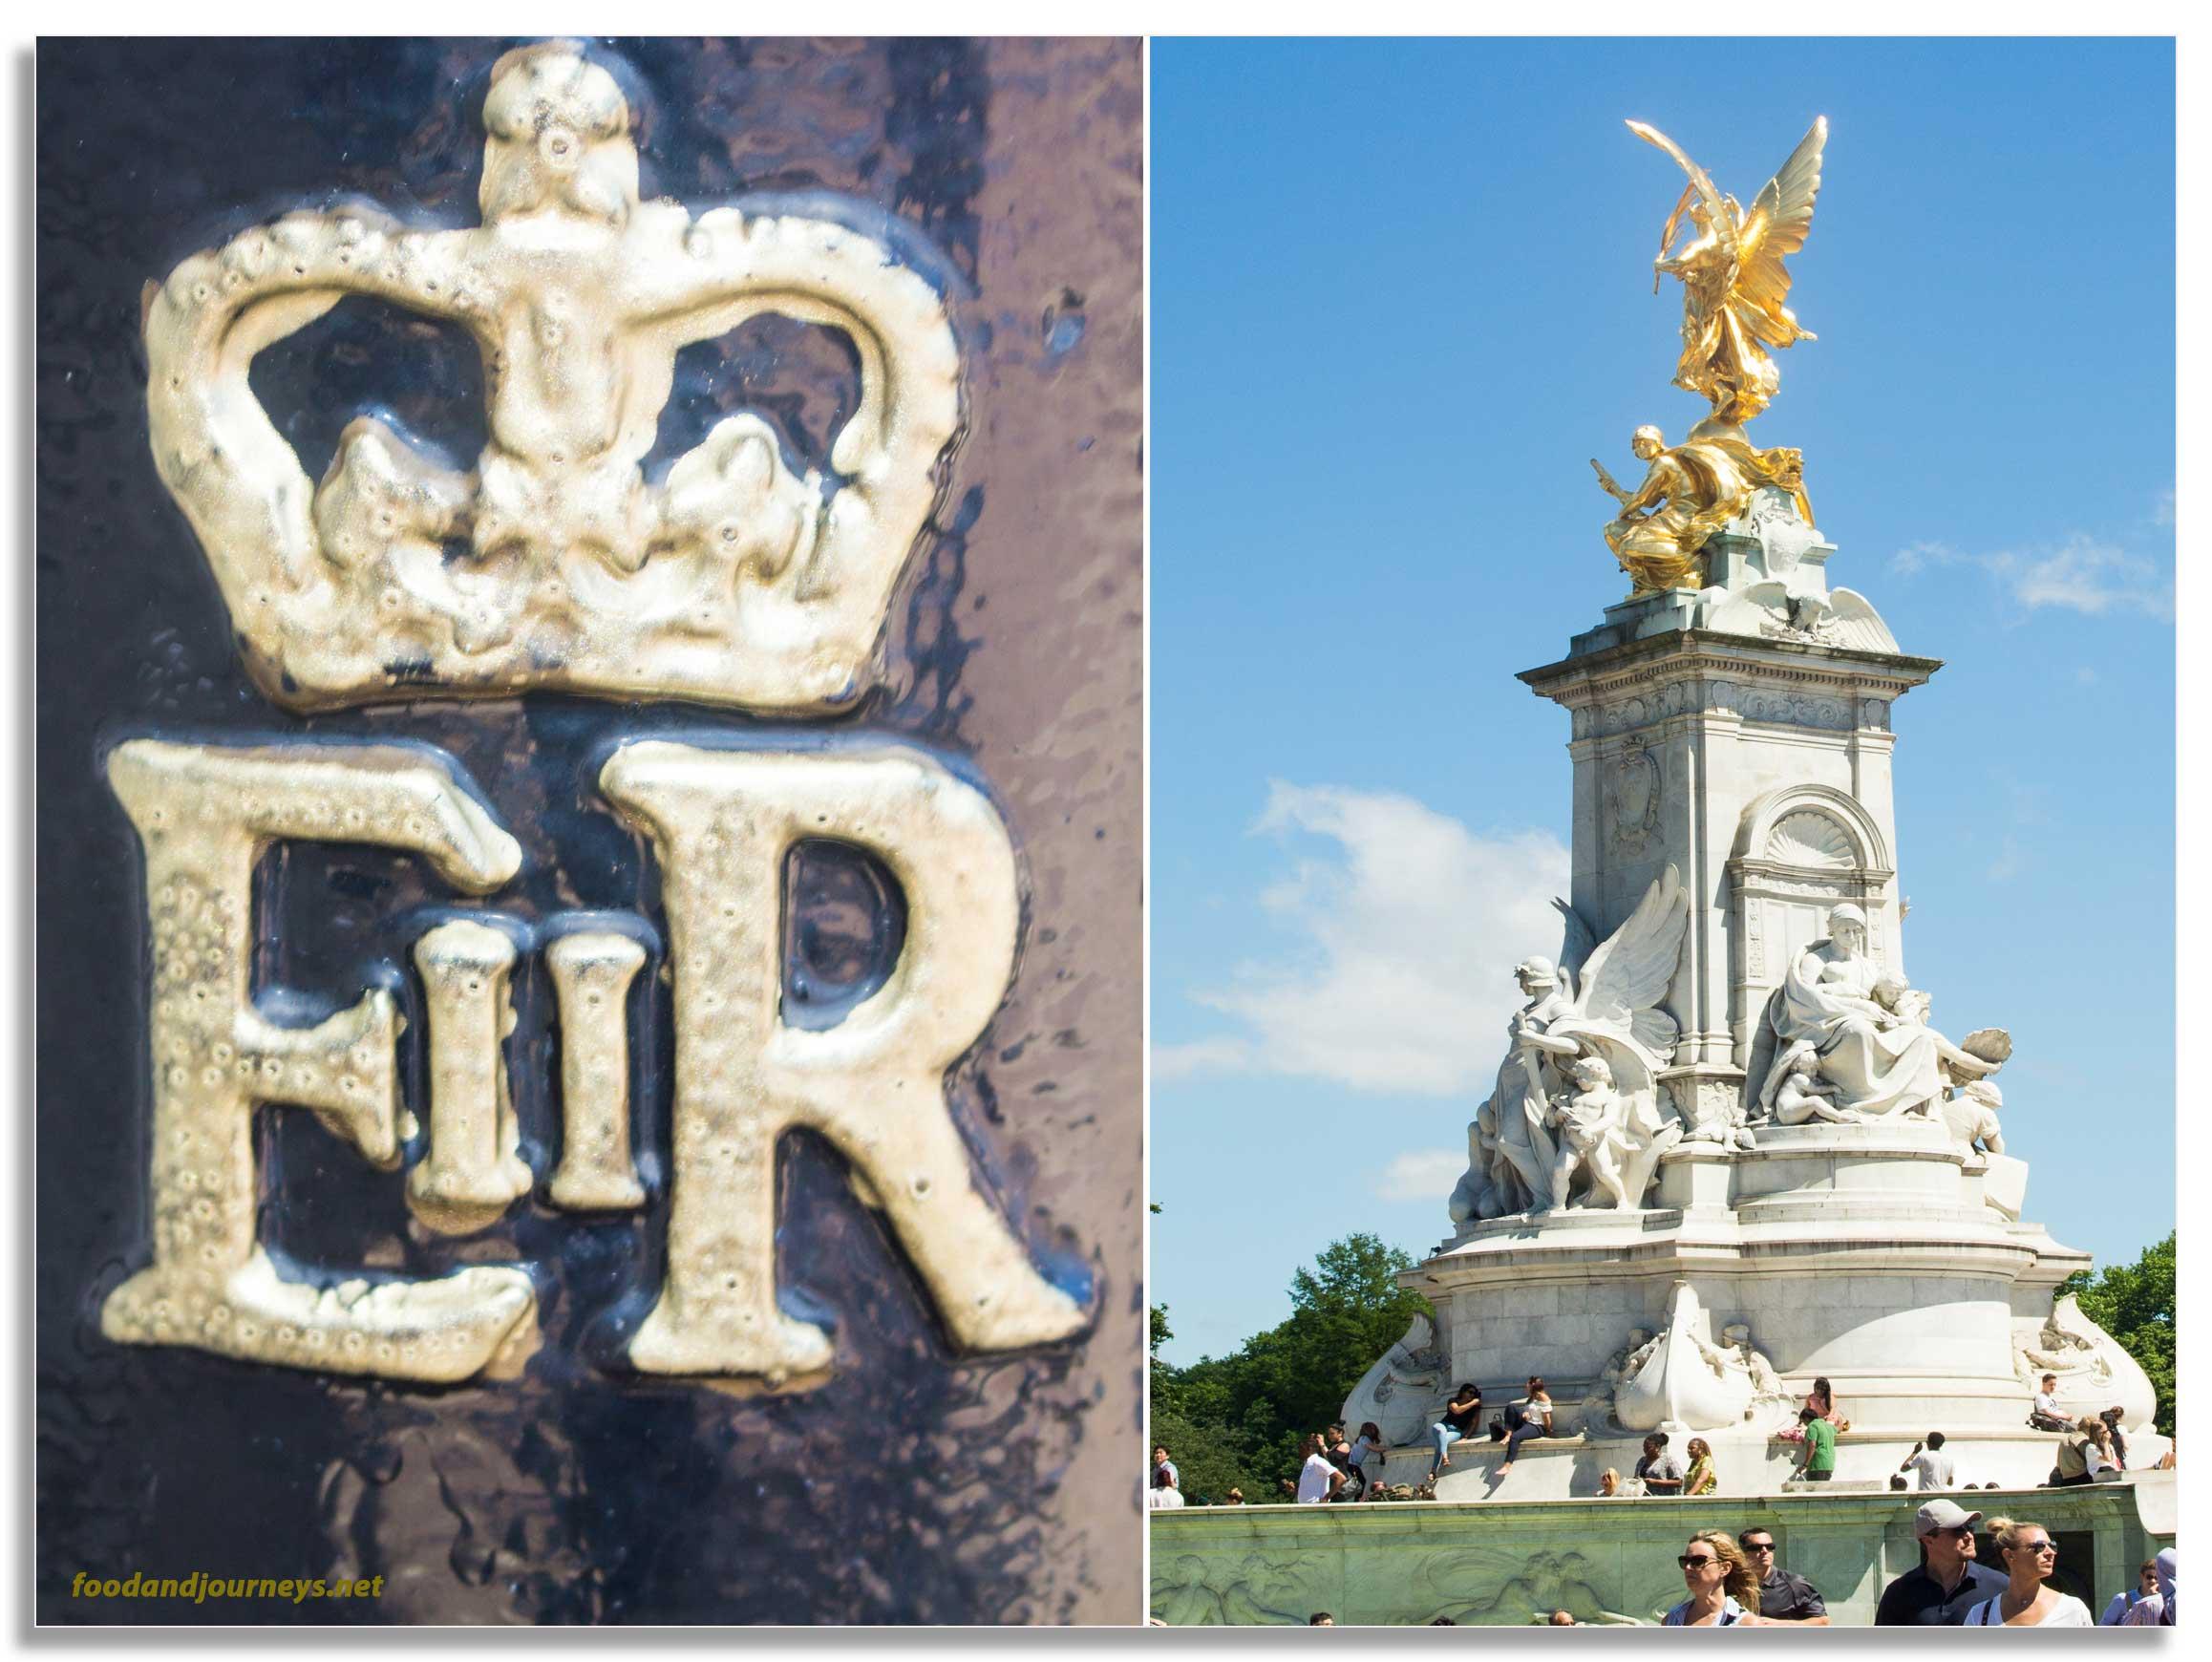 EIIR Cypher Victoria Memorial Buckingham Palace London|foodandjourneys.net